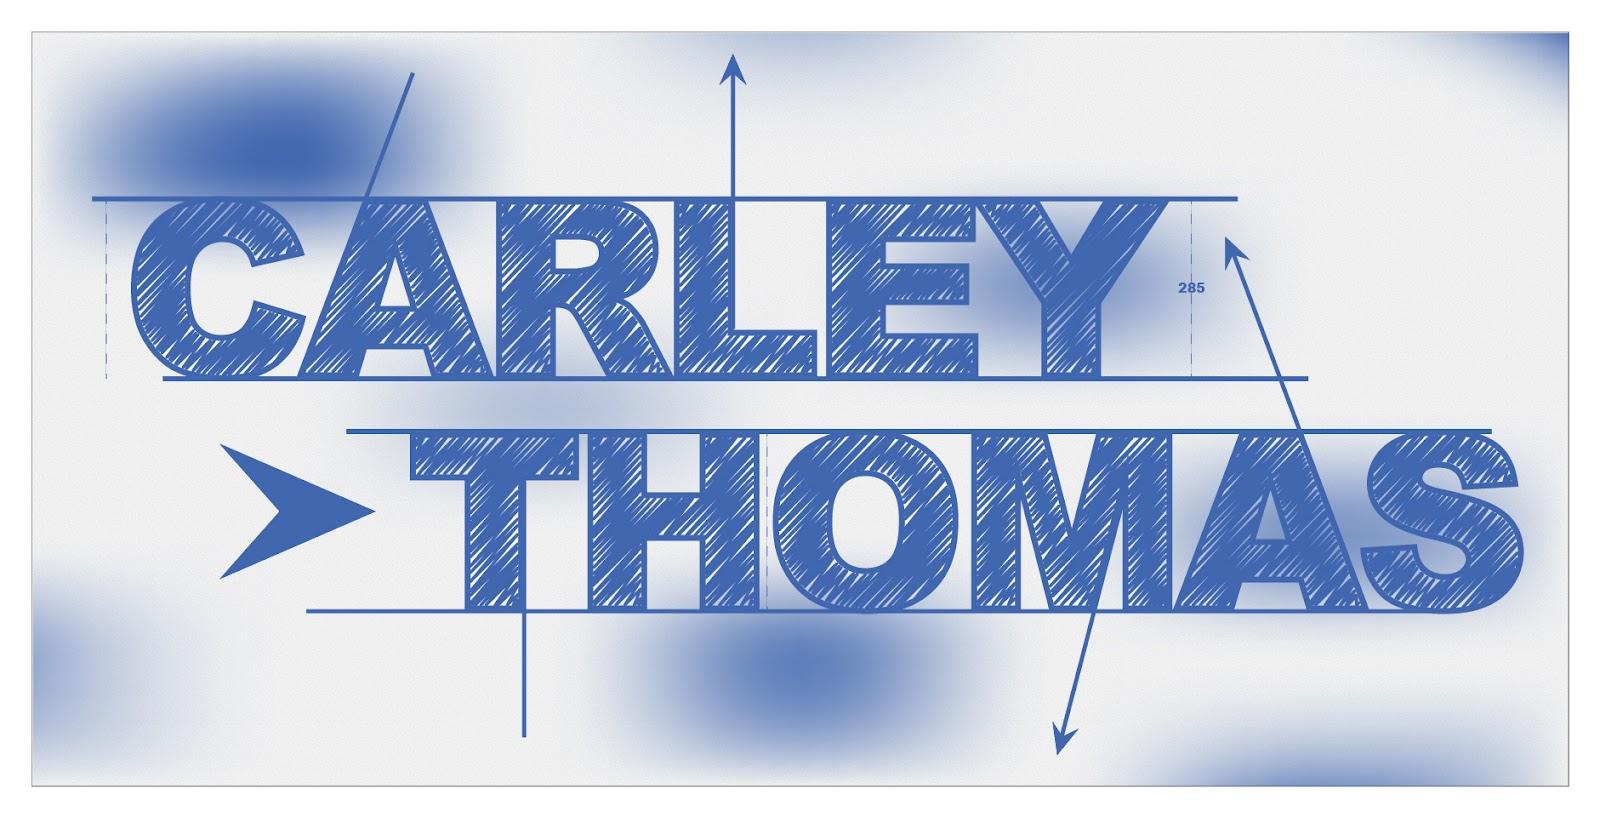 Carleys graphic design march 2012 httplayersmagazineblueprint style text in adobe illustratorml malvernweather Images